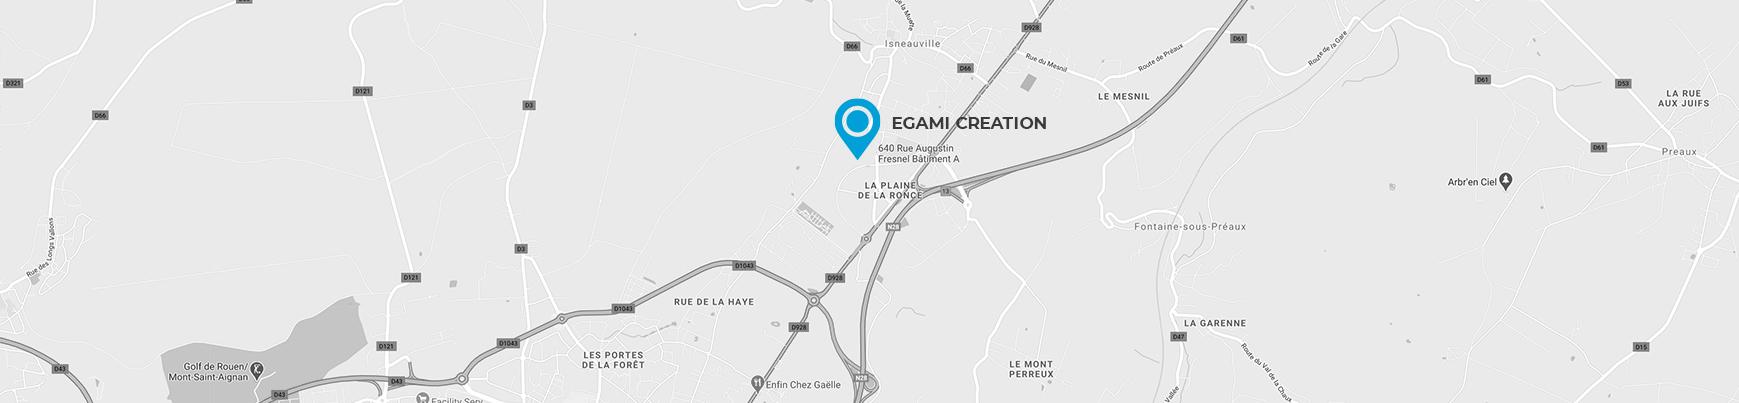 Egami Creation, agence de communication Rouen